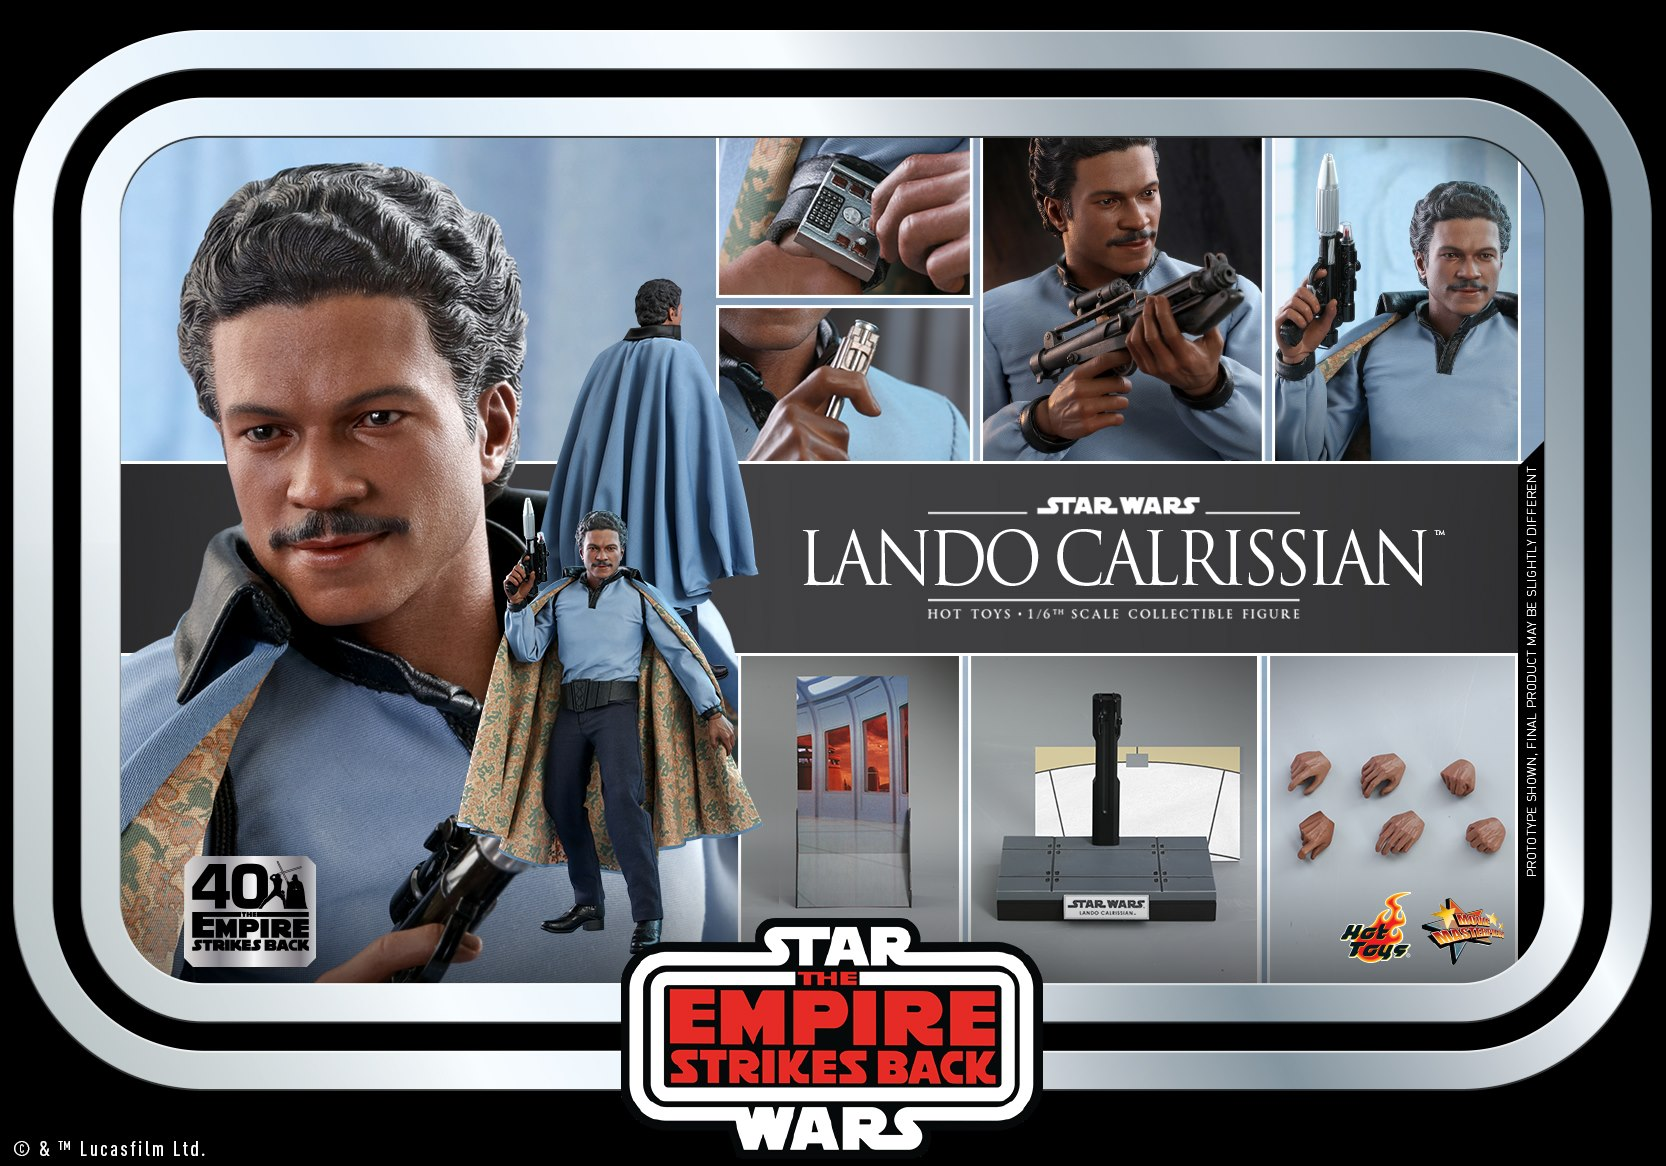 Hot Toys Lando Calrissian